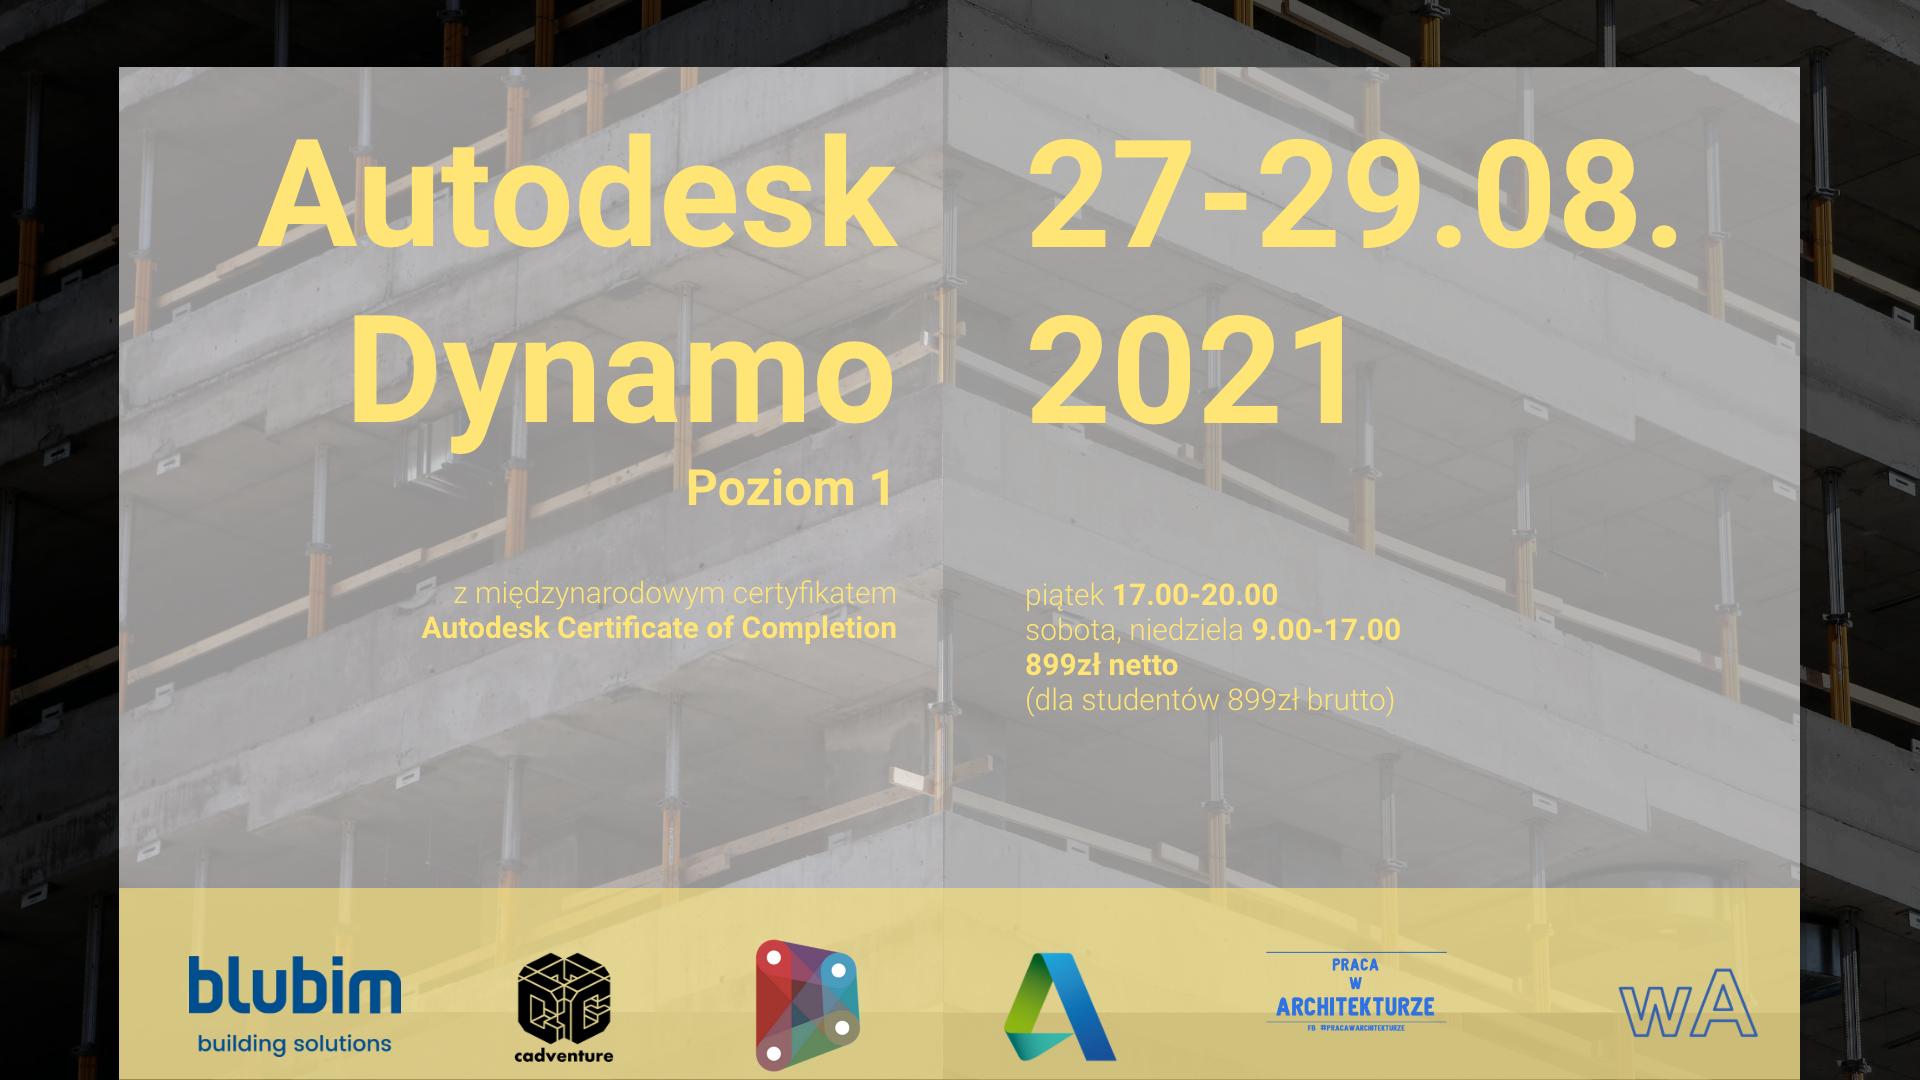 Dynamo 27-29.08